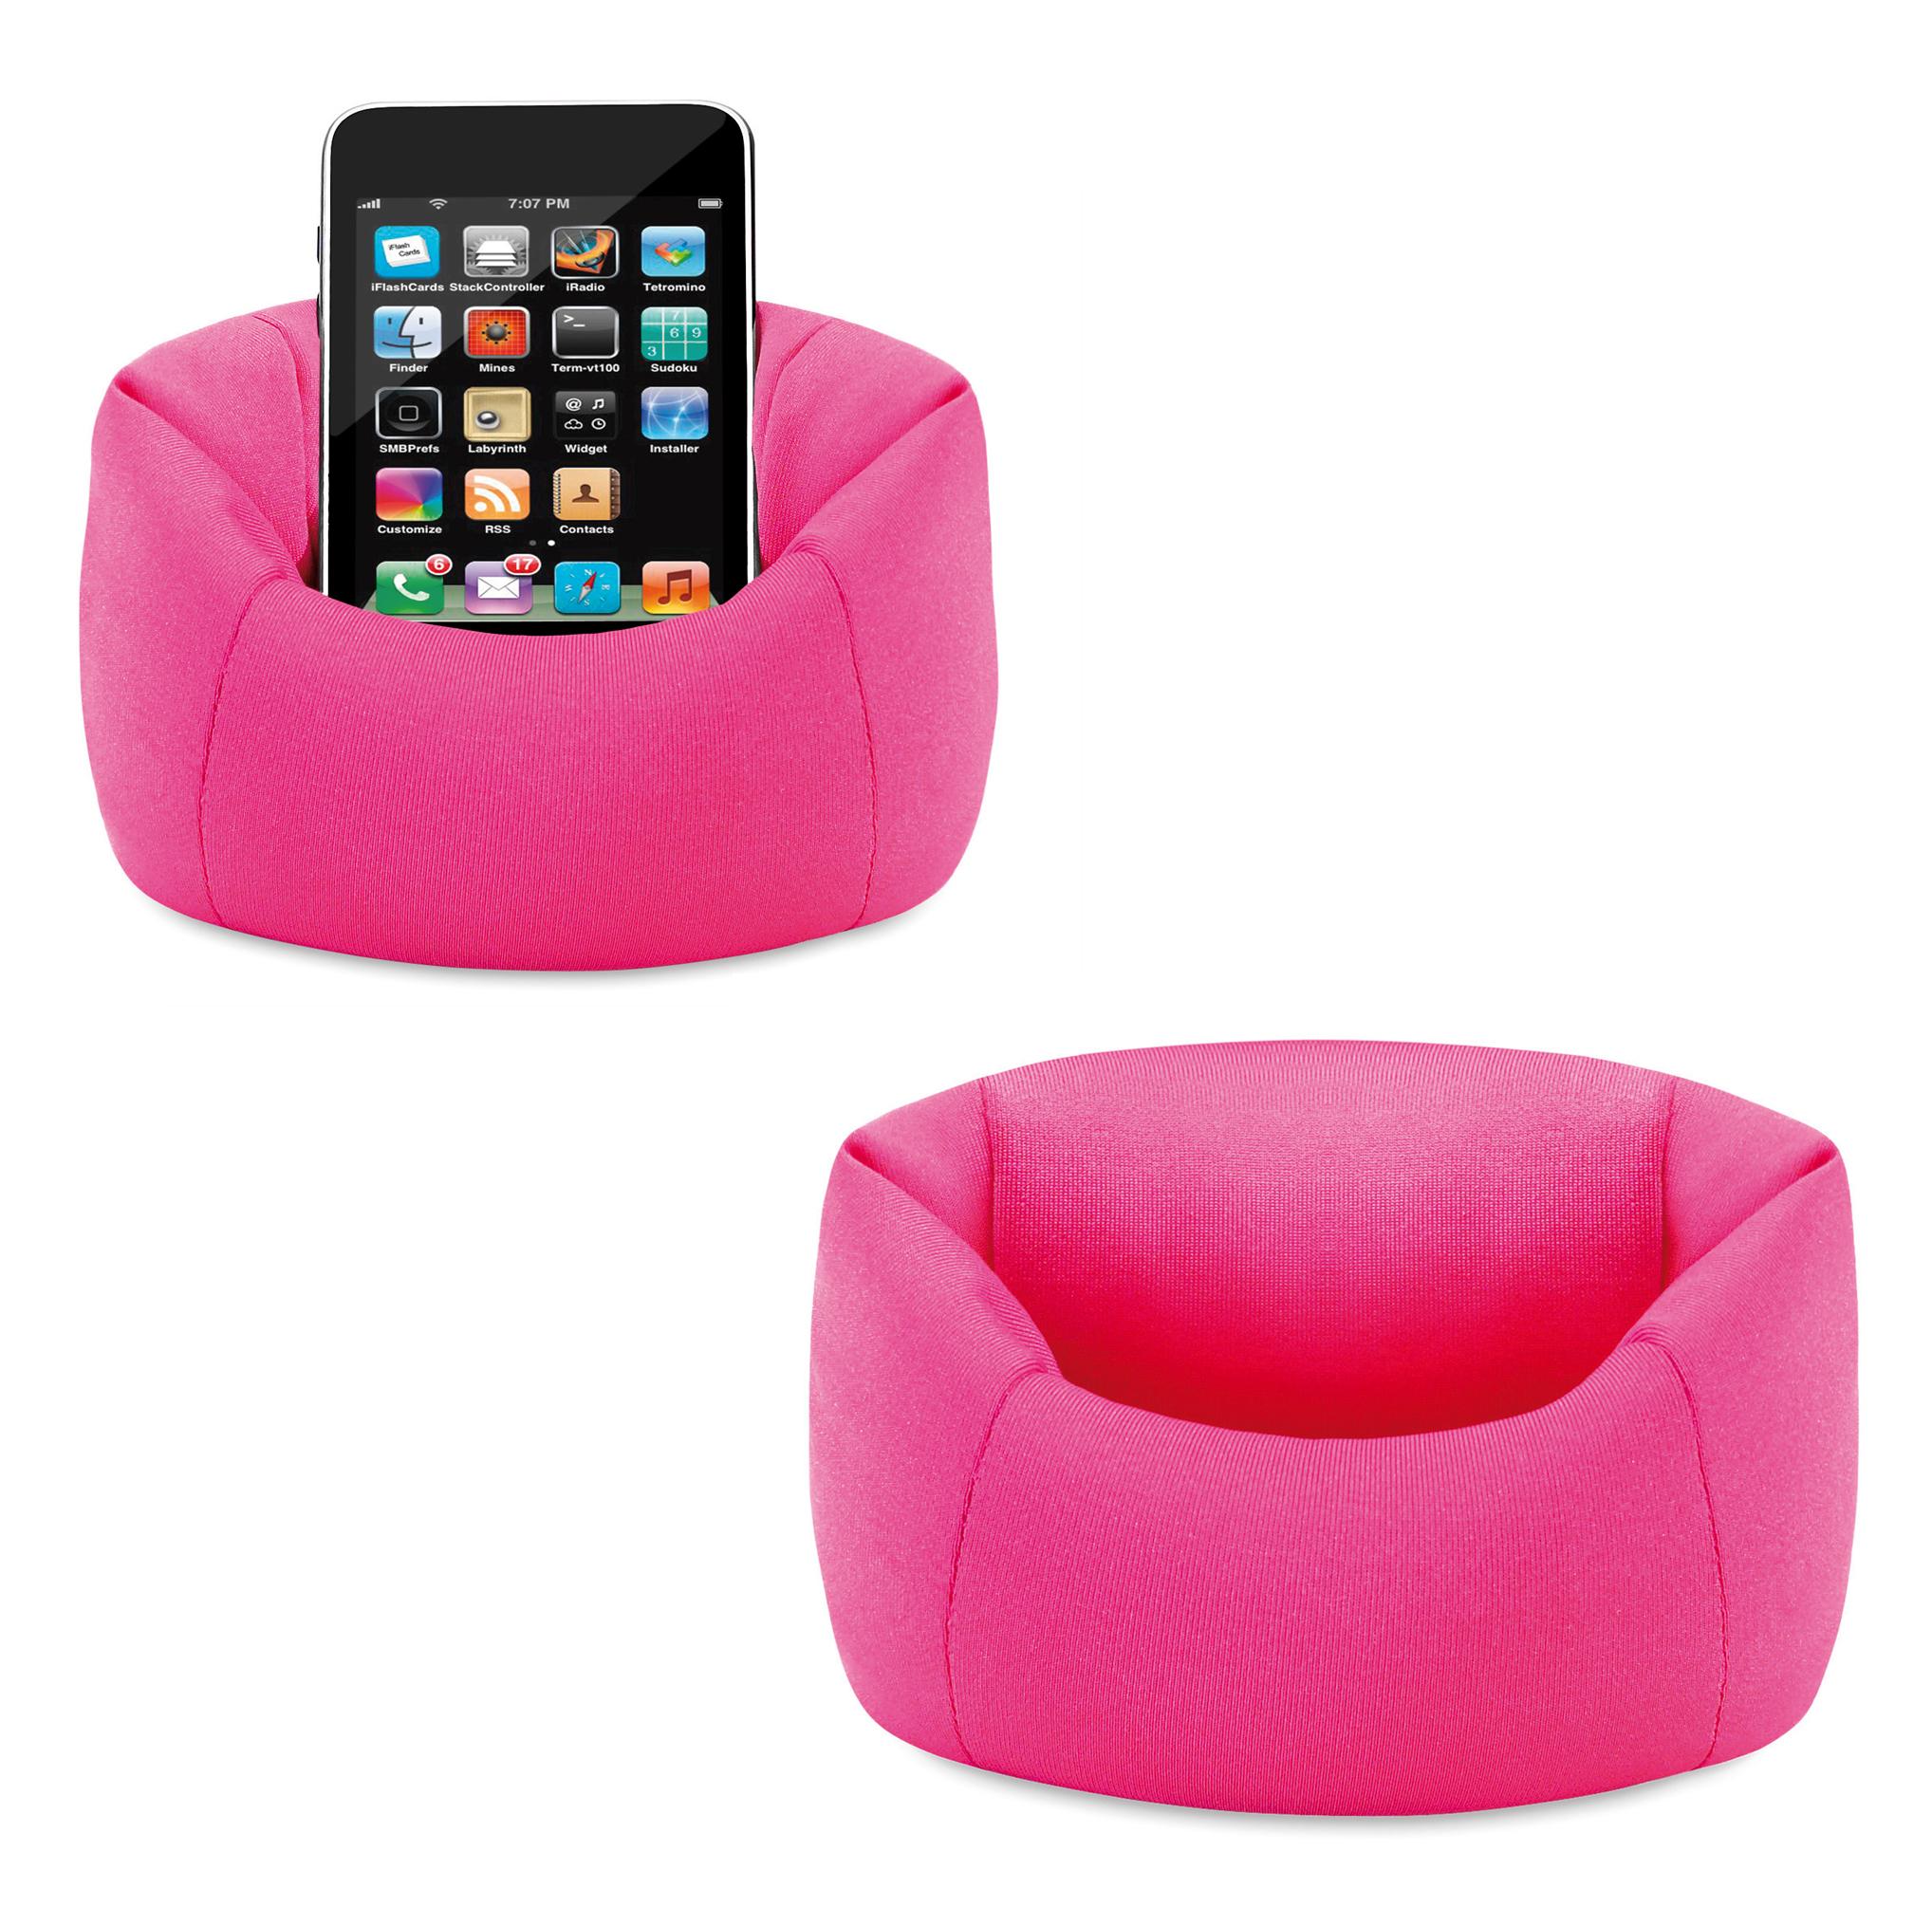 Bean Bag Chair Sofa Holds Mobile Phone Blackberry Samsung or